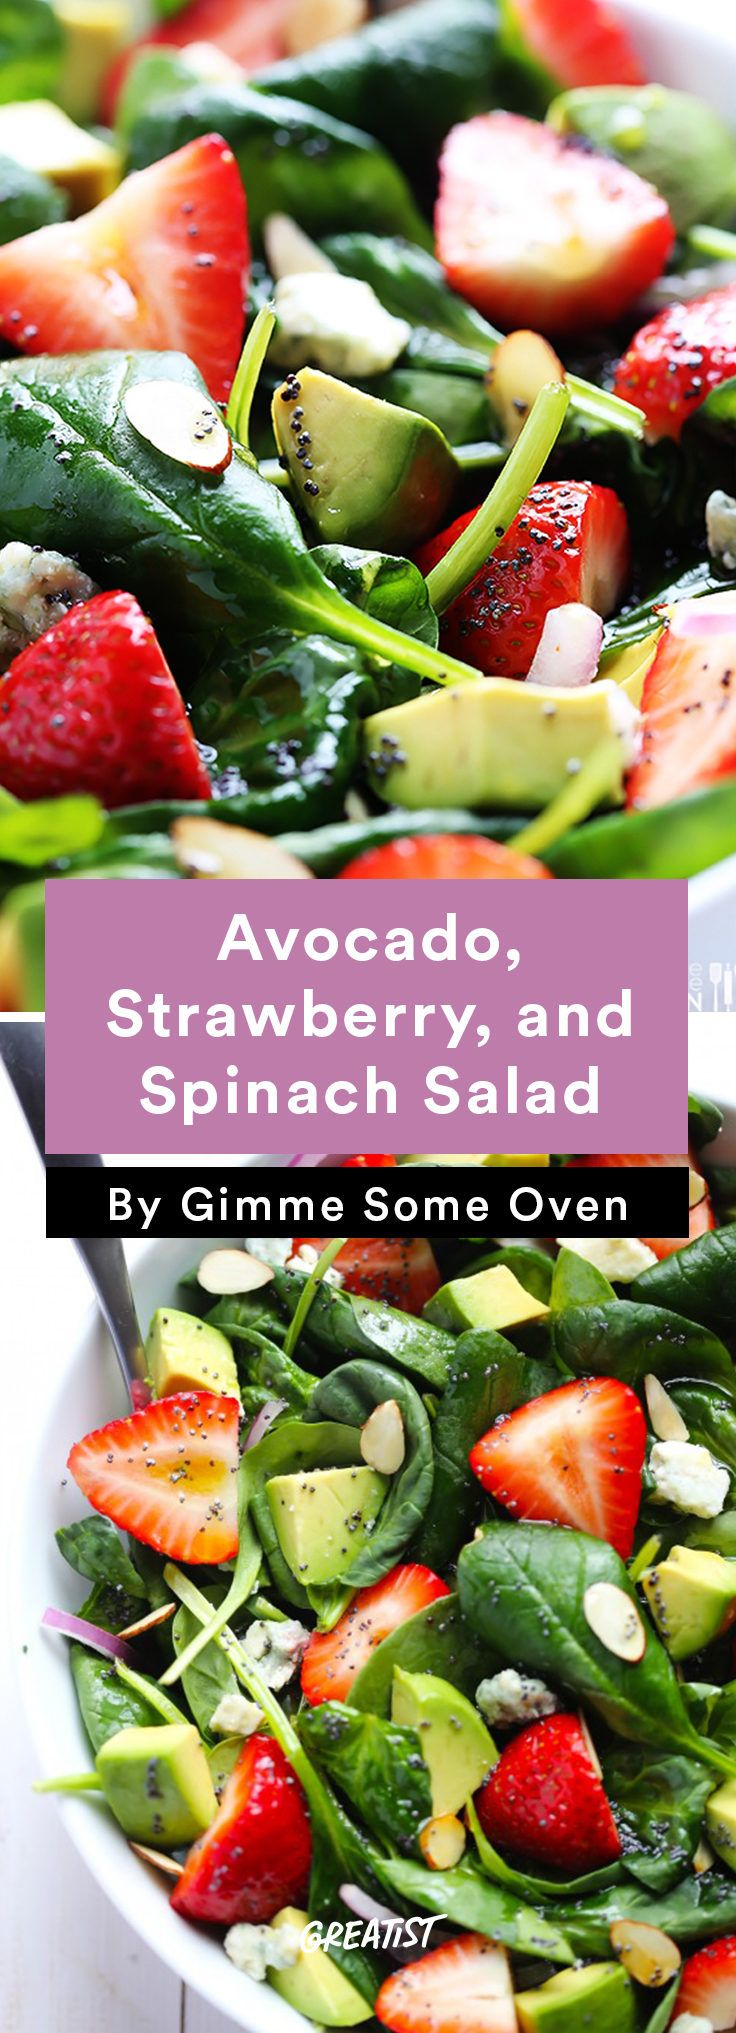 Avocado, Strawberry, and Spinach Salad